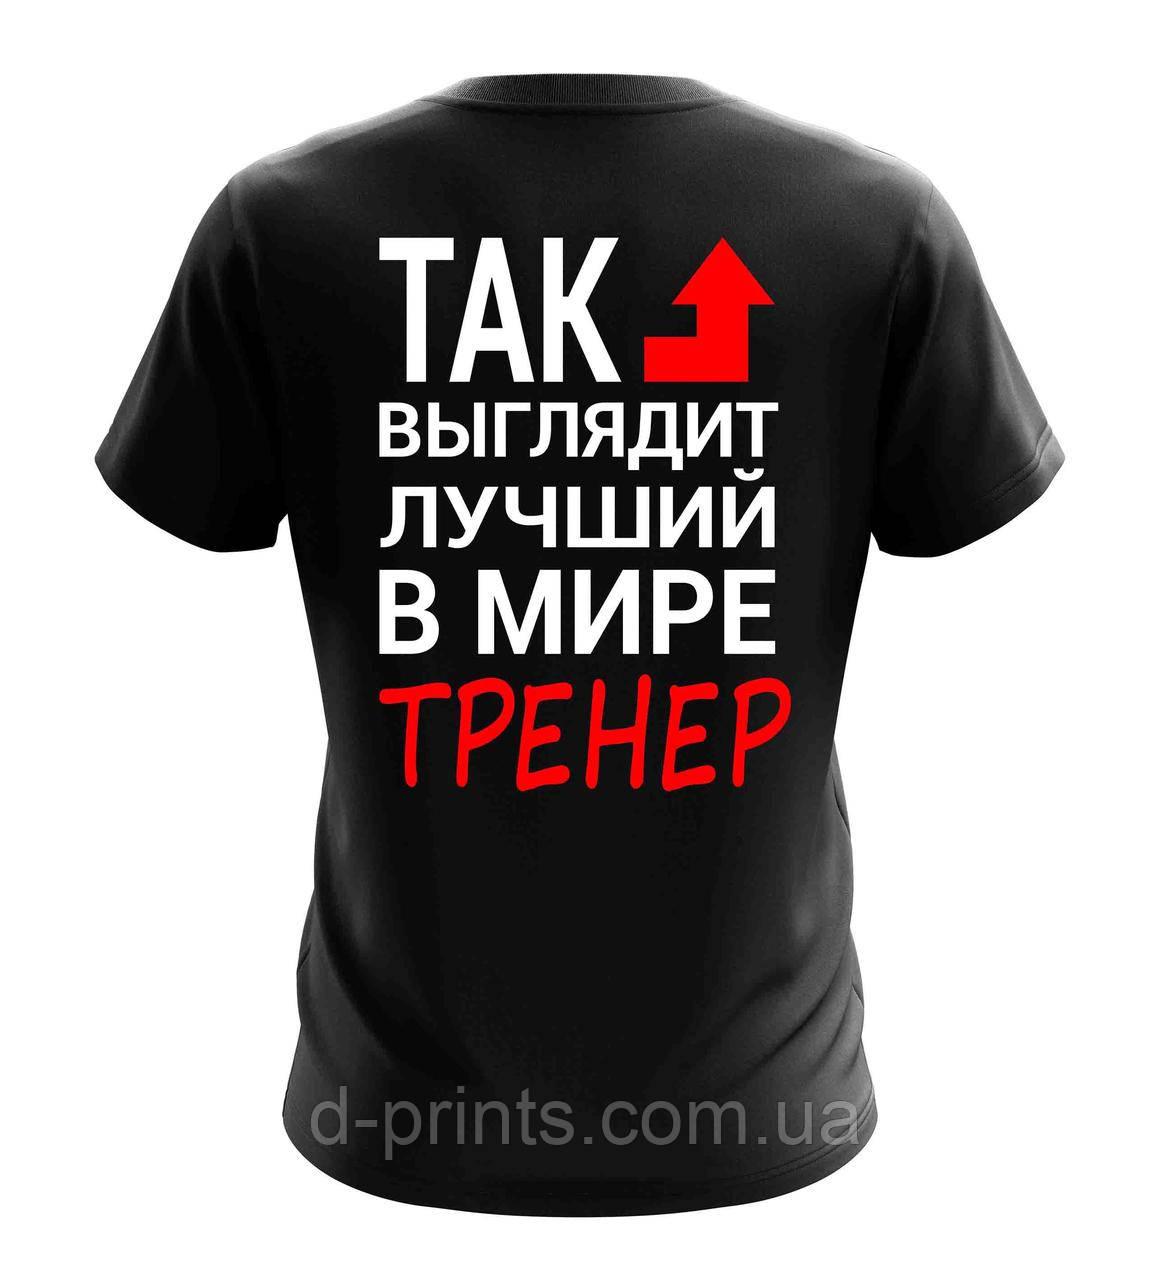 "Футболка мужская с рисунком ""Тренер"" MF-12-44"